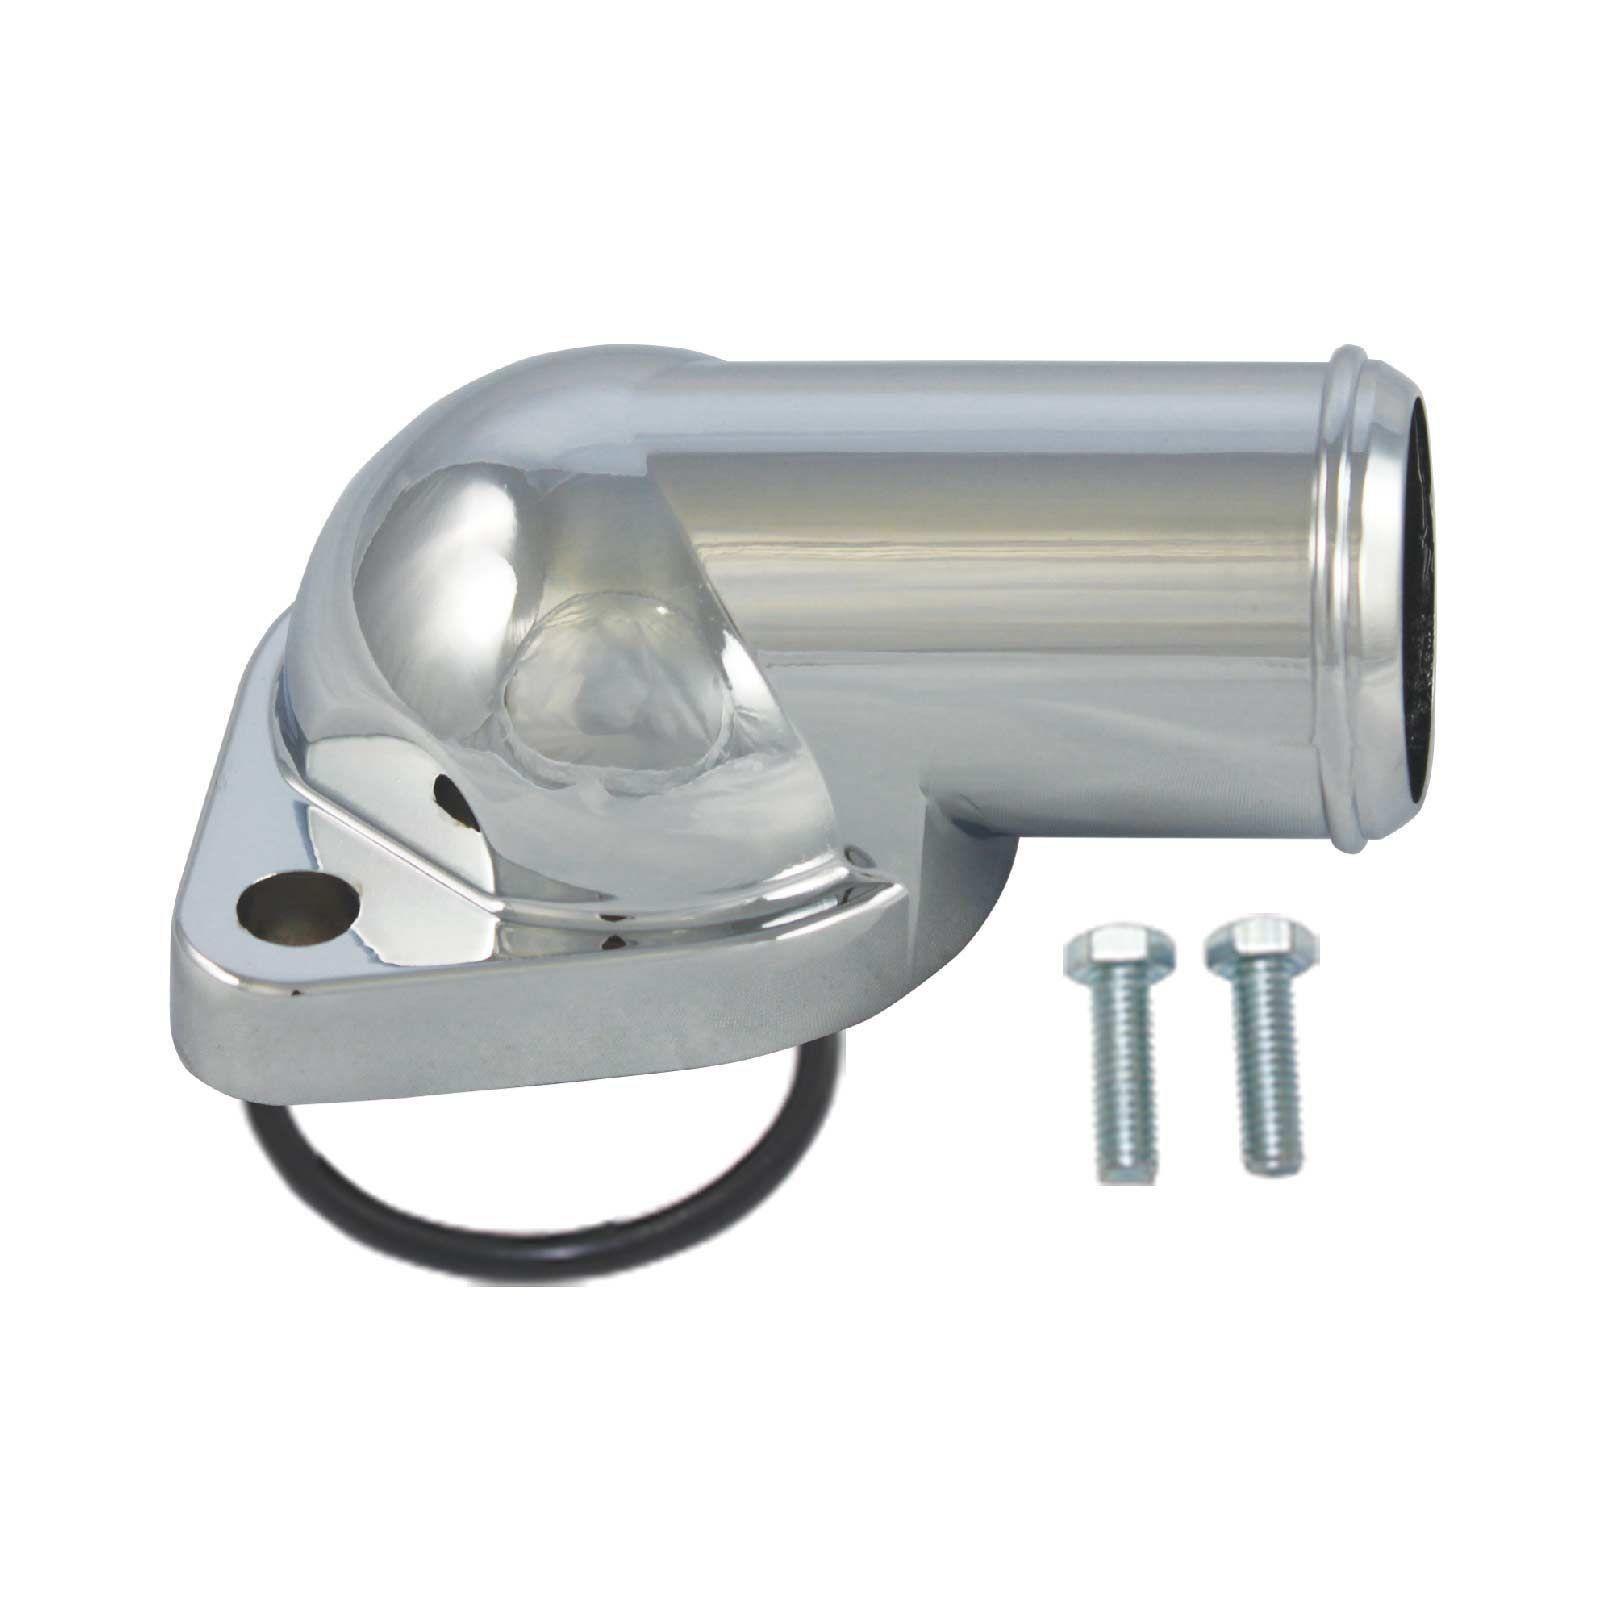 Proflow Aluminium Water Neck Pontiac V8 O'Ring Style Chrome